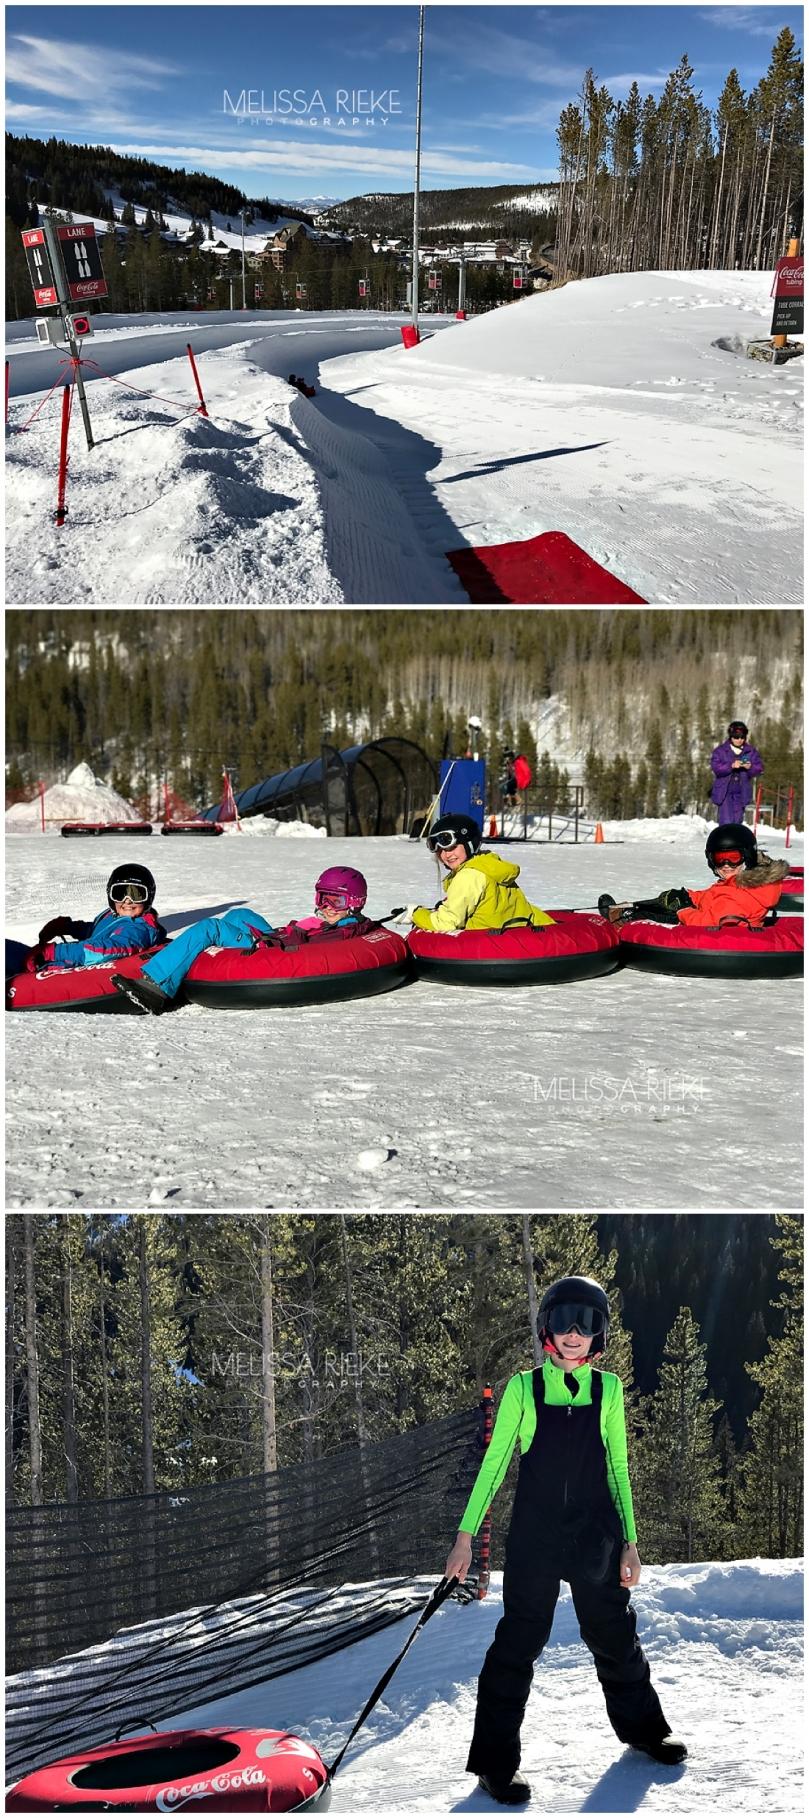 Best Tubing Hill Winter Park Ski Trip Family Fun Vacation